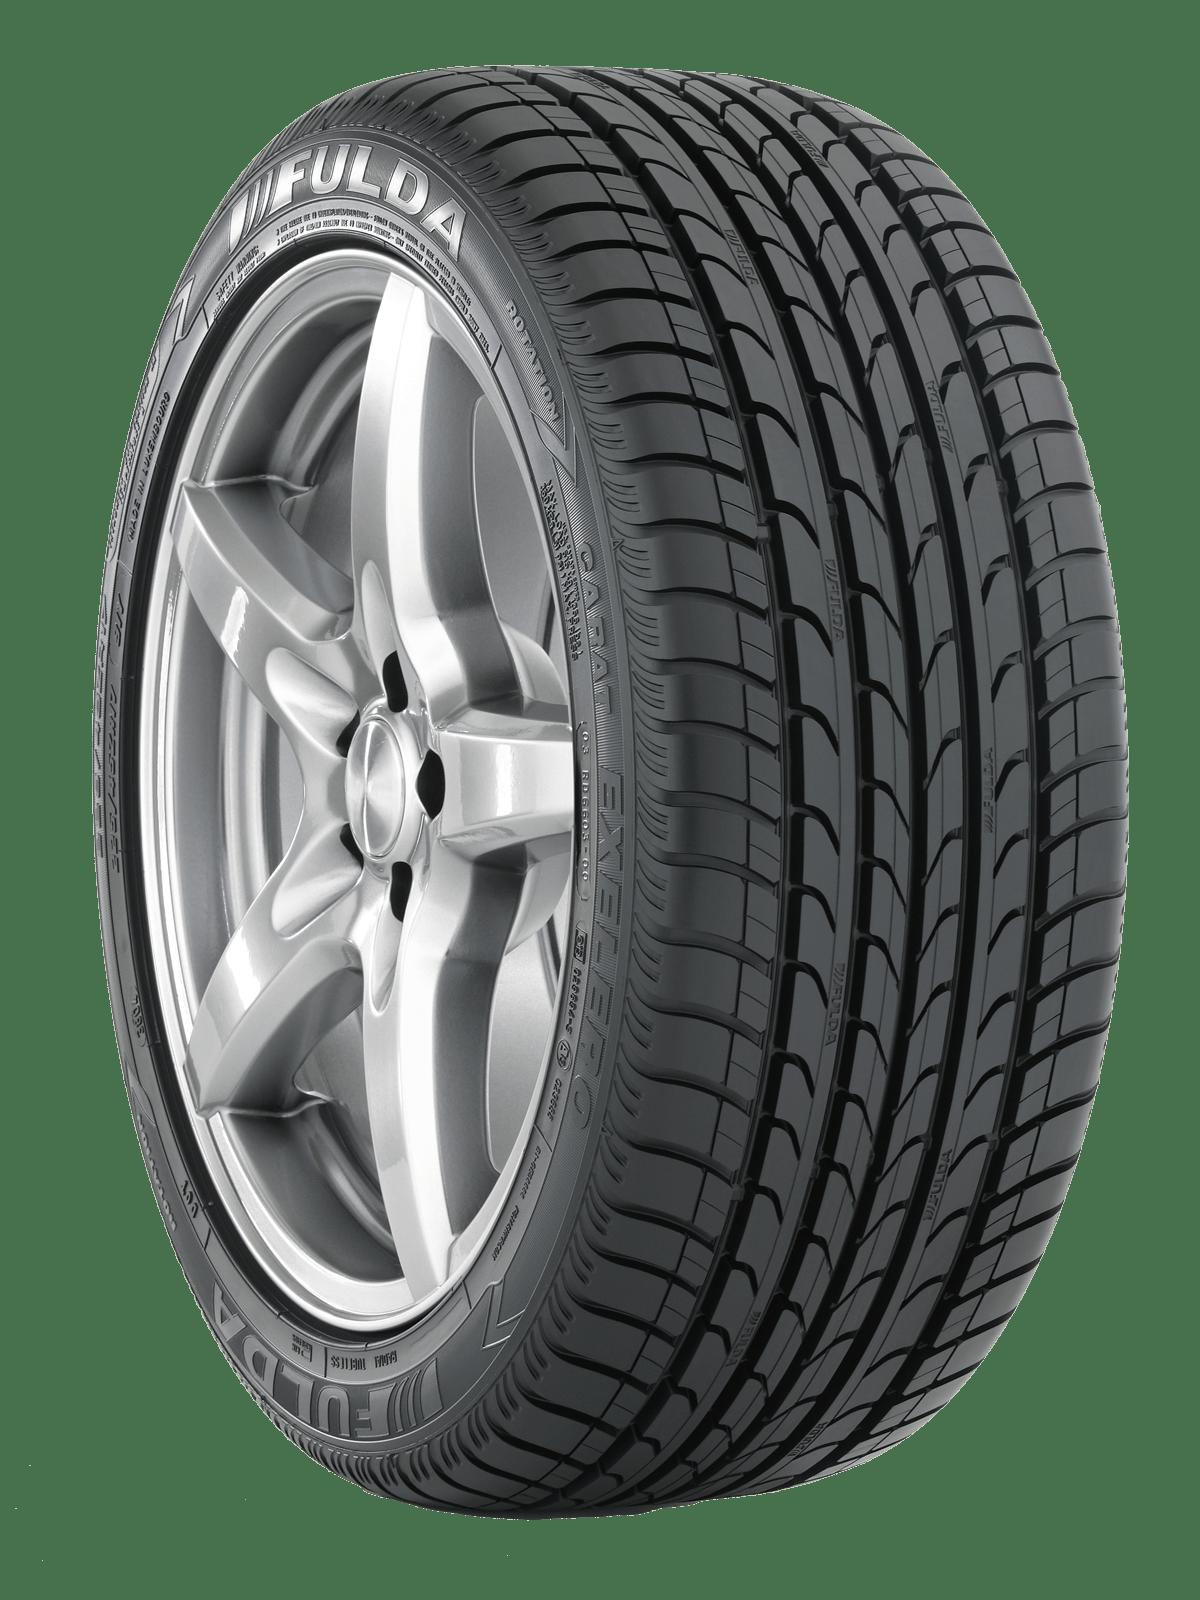 Bike Tire PNG - 162981